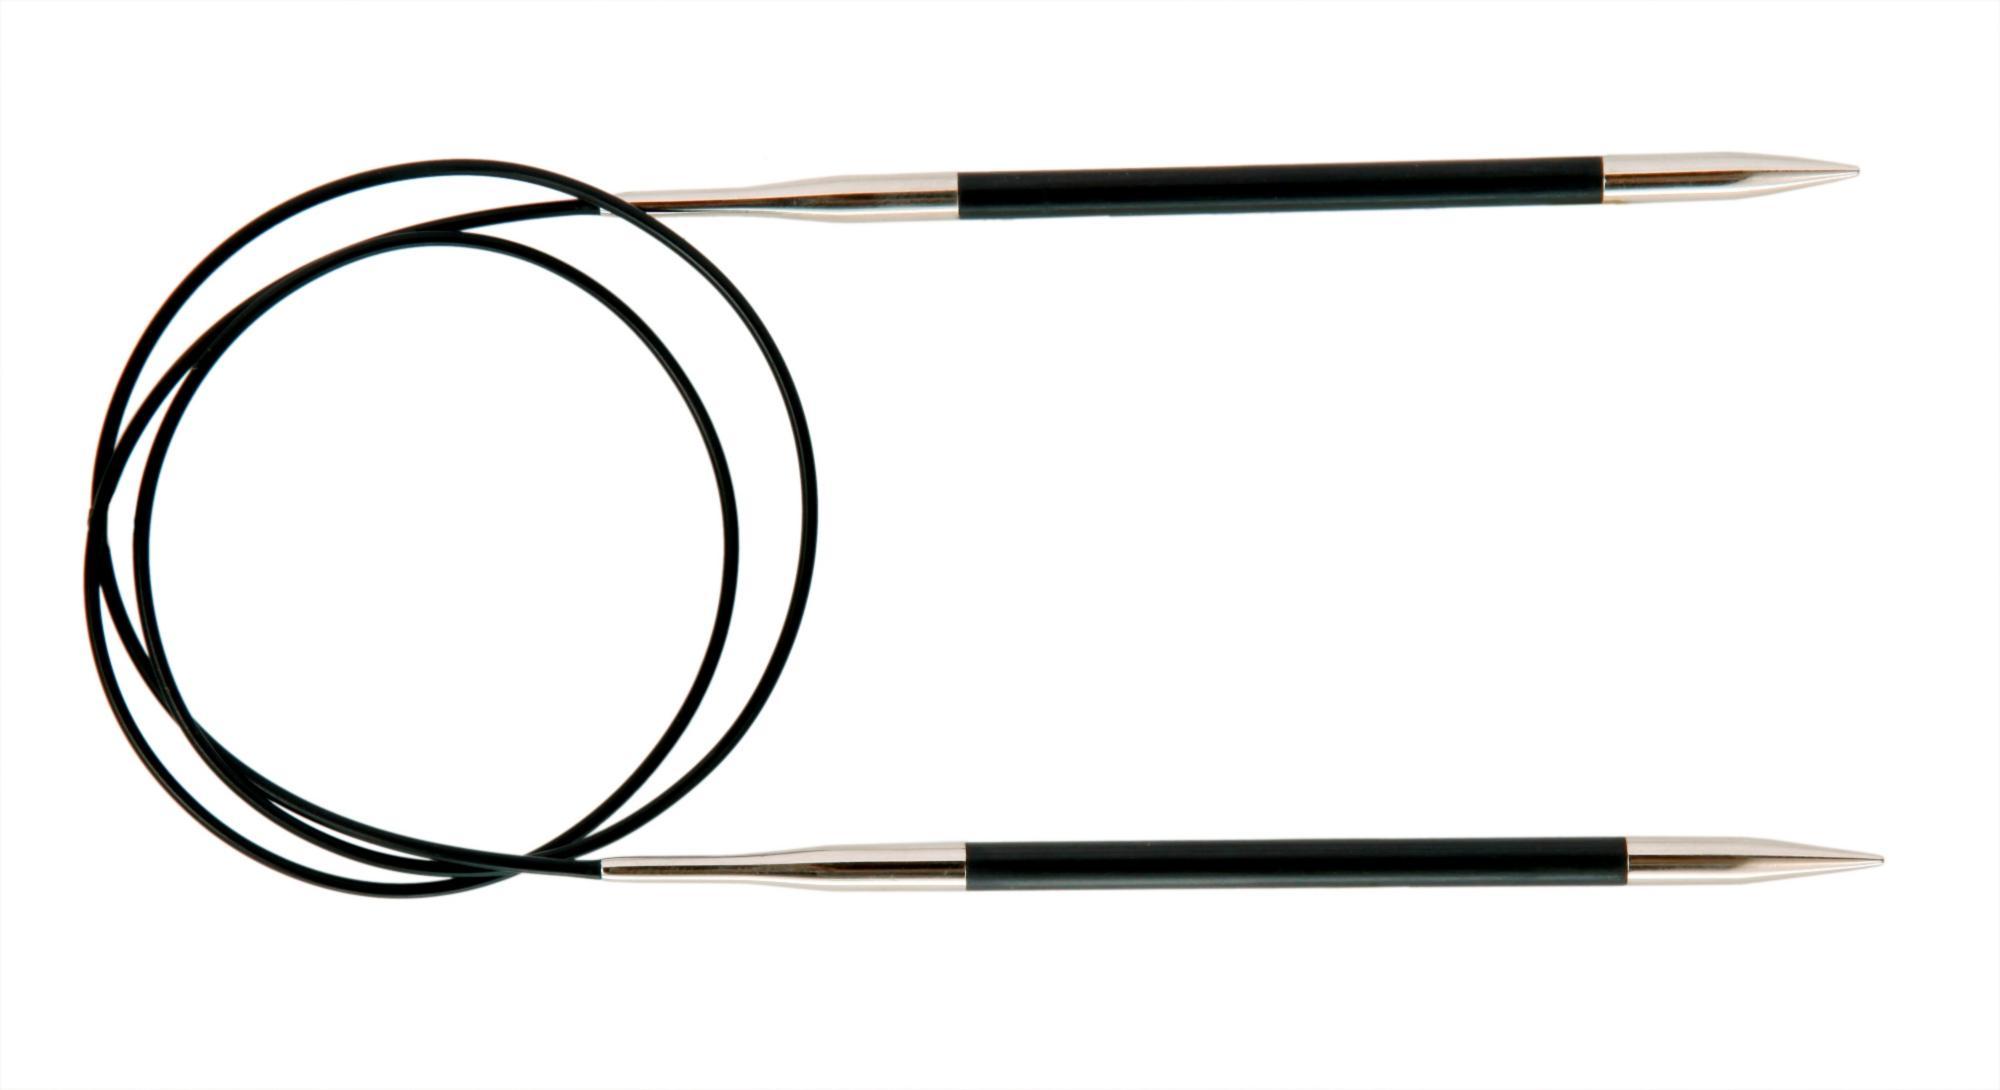 Спицы круговые 40 см Karbonz KnitPro, 41152, 6.00 мм